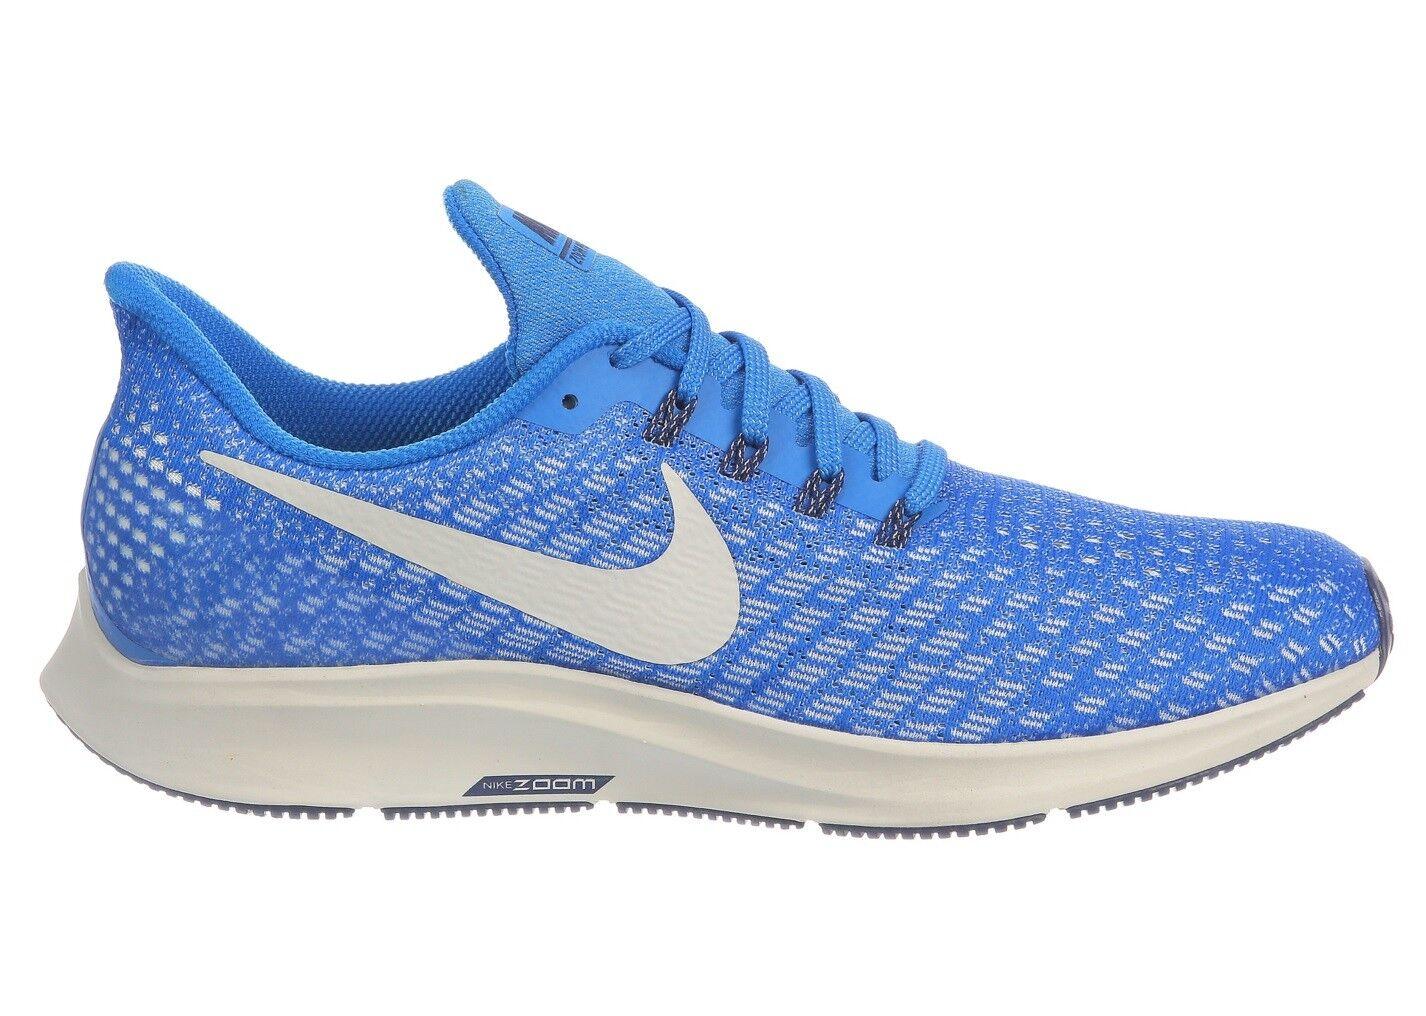 Nike Air Zoom Pegasus 35 Mens 942851-402 Cobalt Blaze Running Shoes Size 10.5